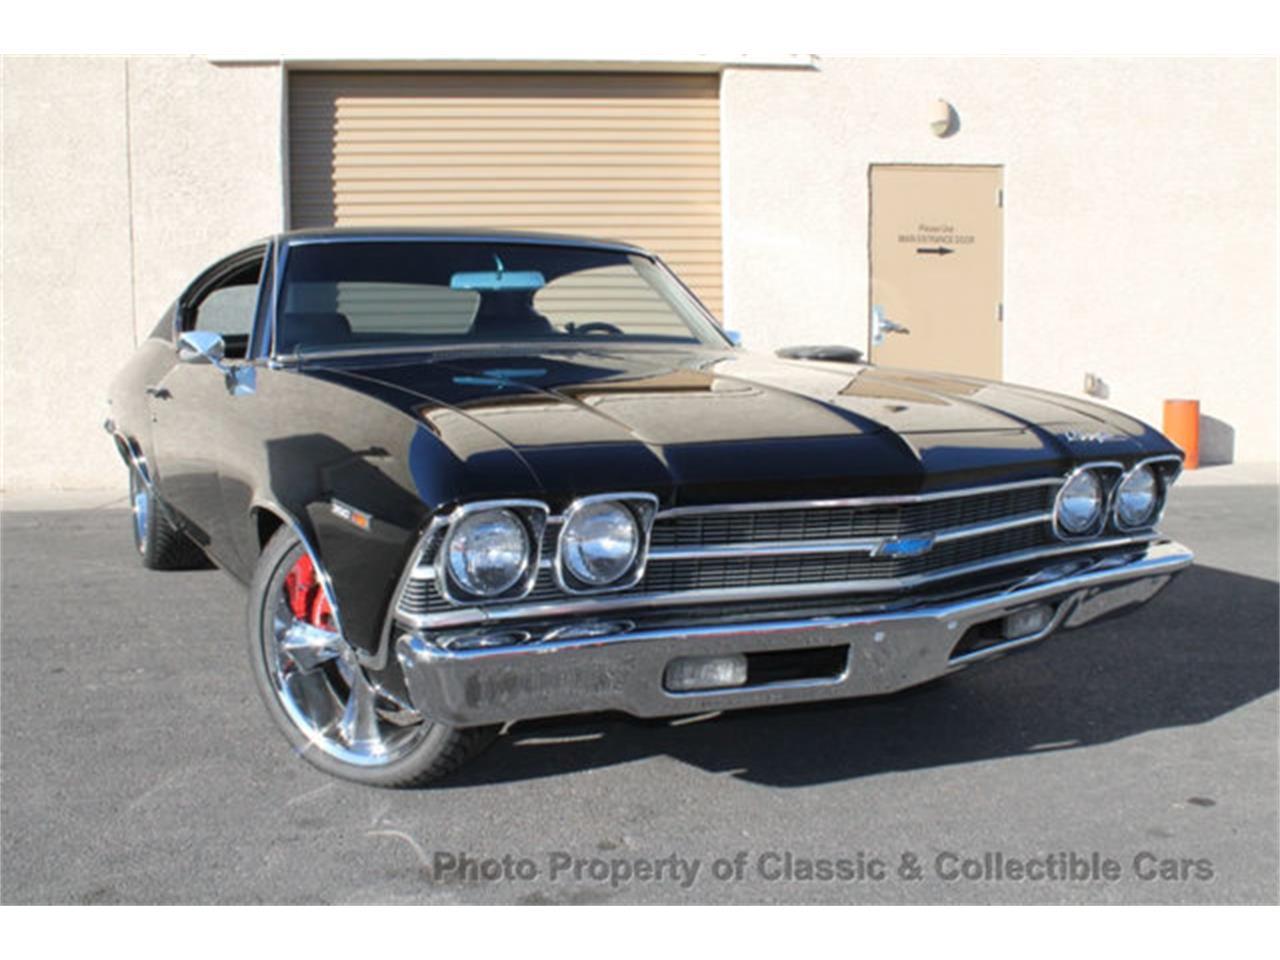 Cars For Sale In Las Vegas >> For Sale 1969 Chevrolet Chevelle In Las Vegas Nevada